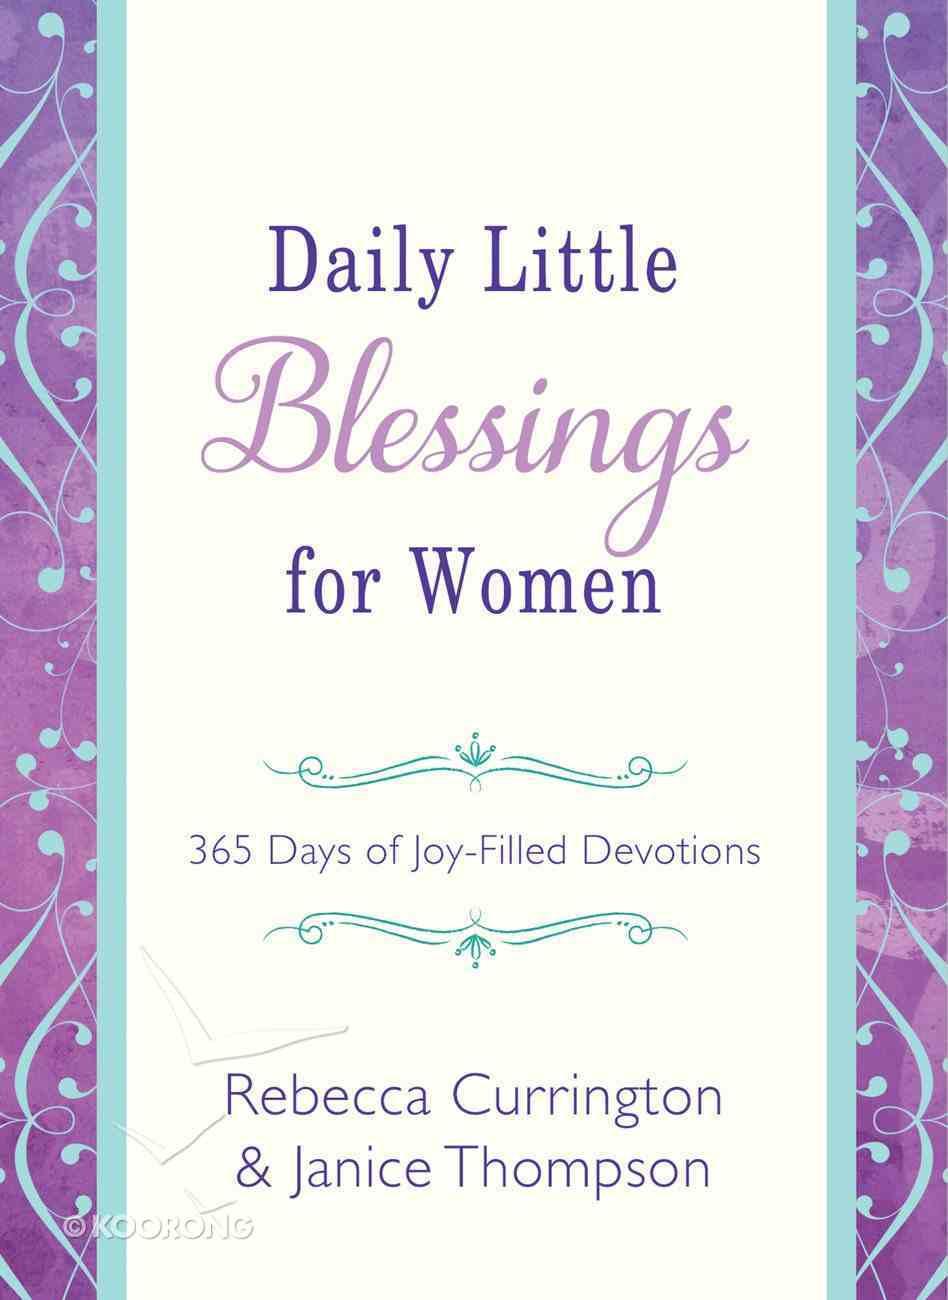 Daily Little Blessings For Women eBook